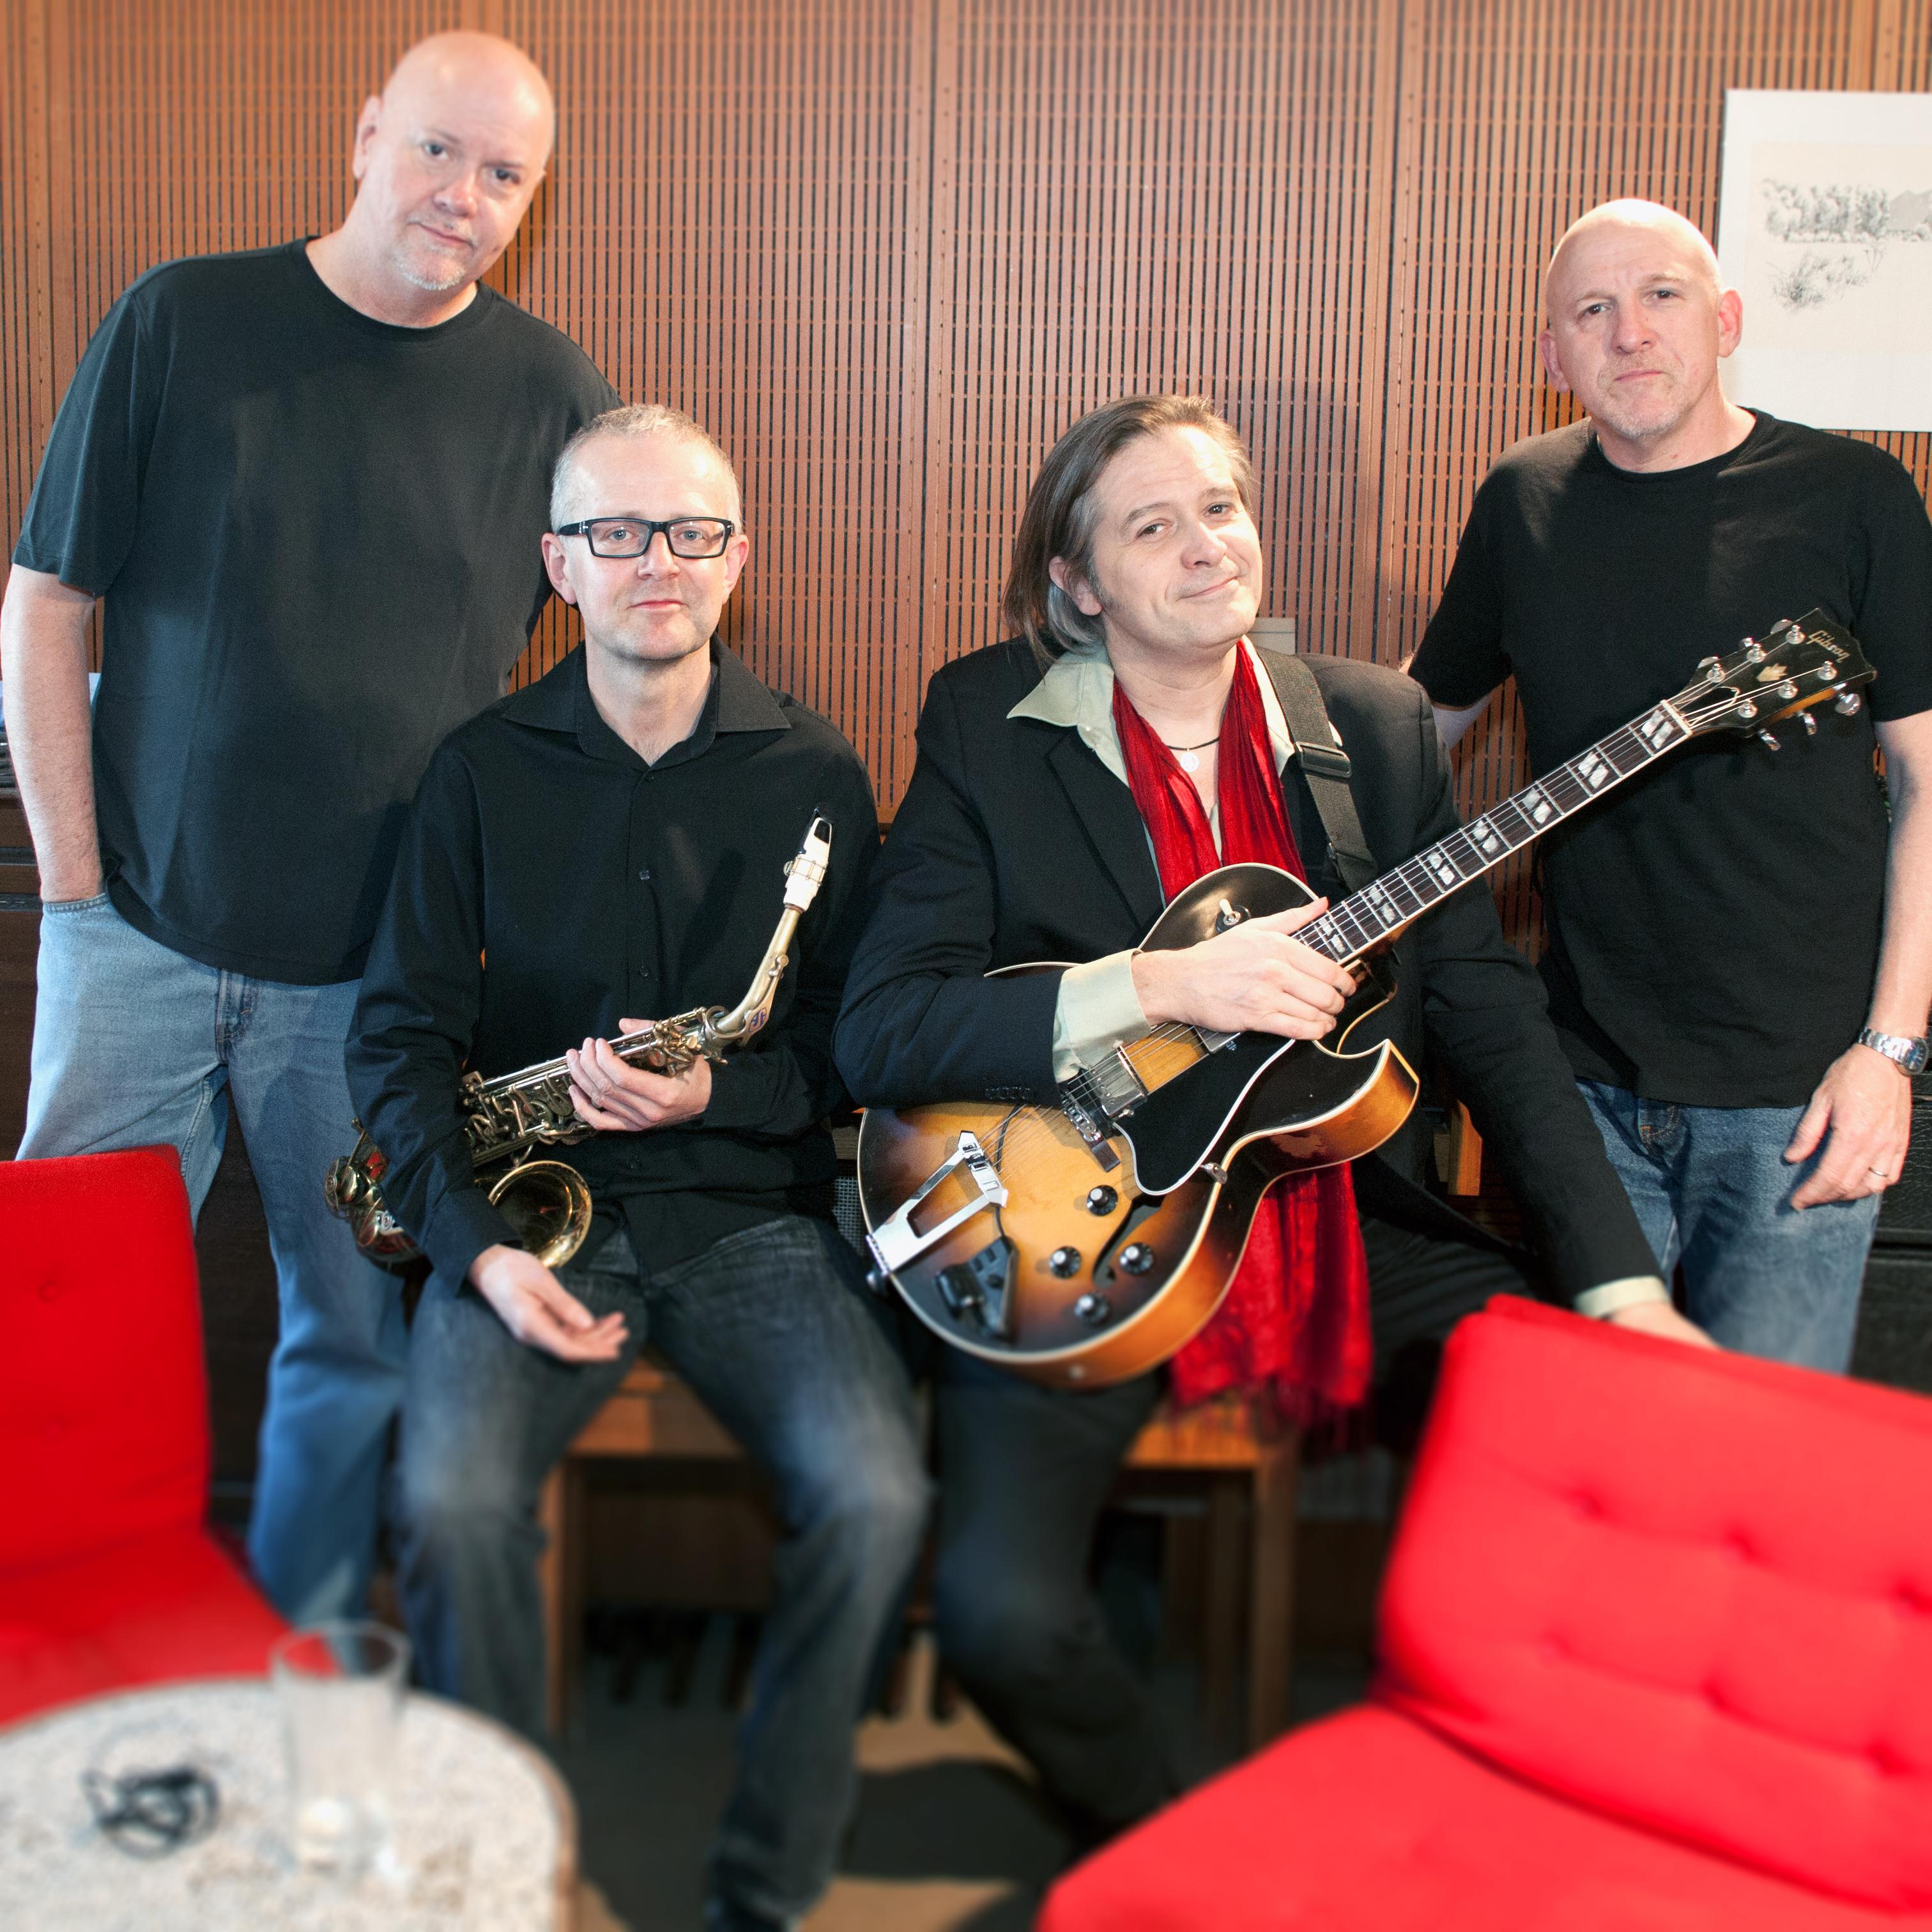 studiorecording boo hoo with jay anderson, adam nussbaum, ulli jünemann, sax